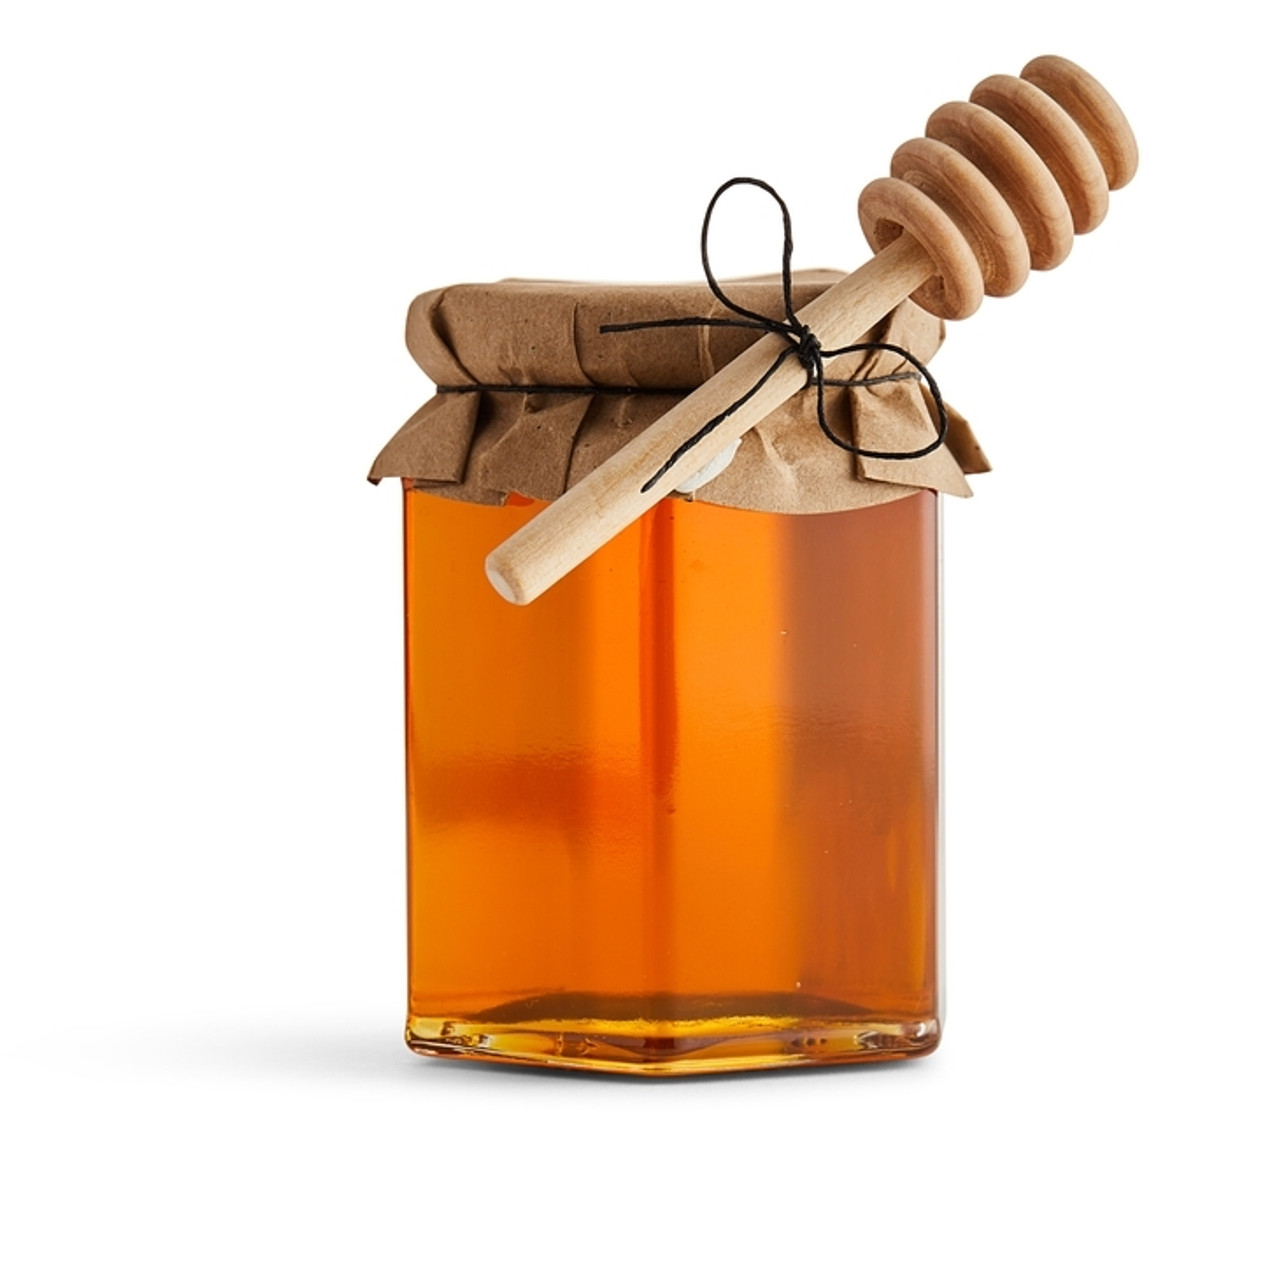 Pure Clover Honey with Dipper - 12oz